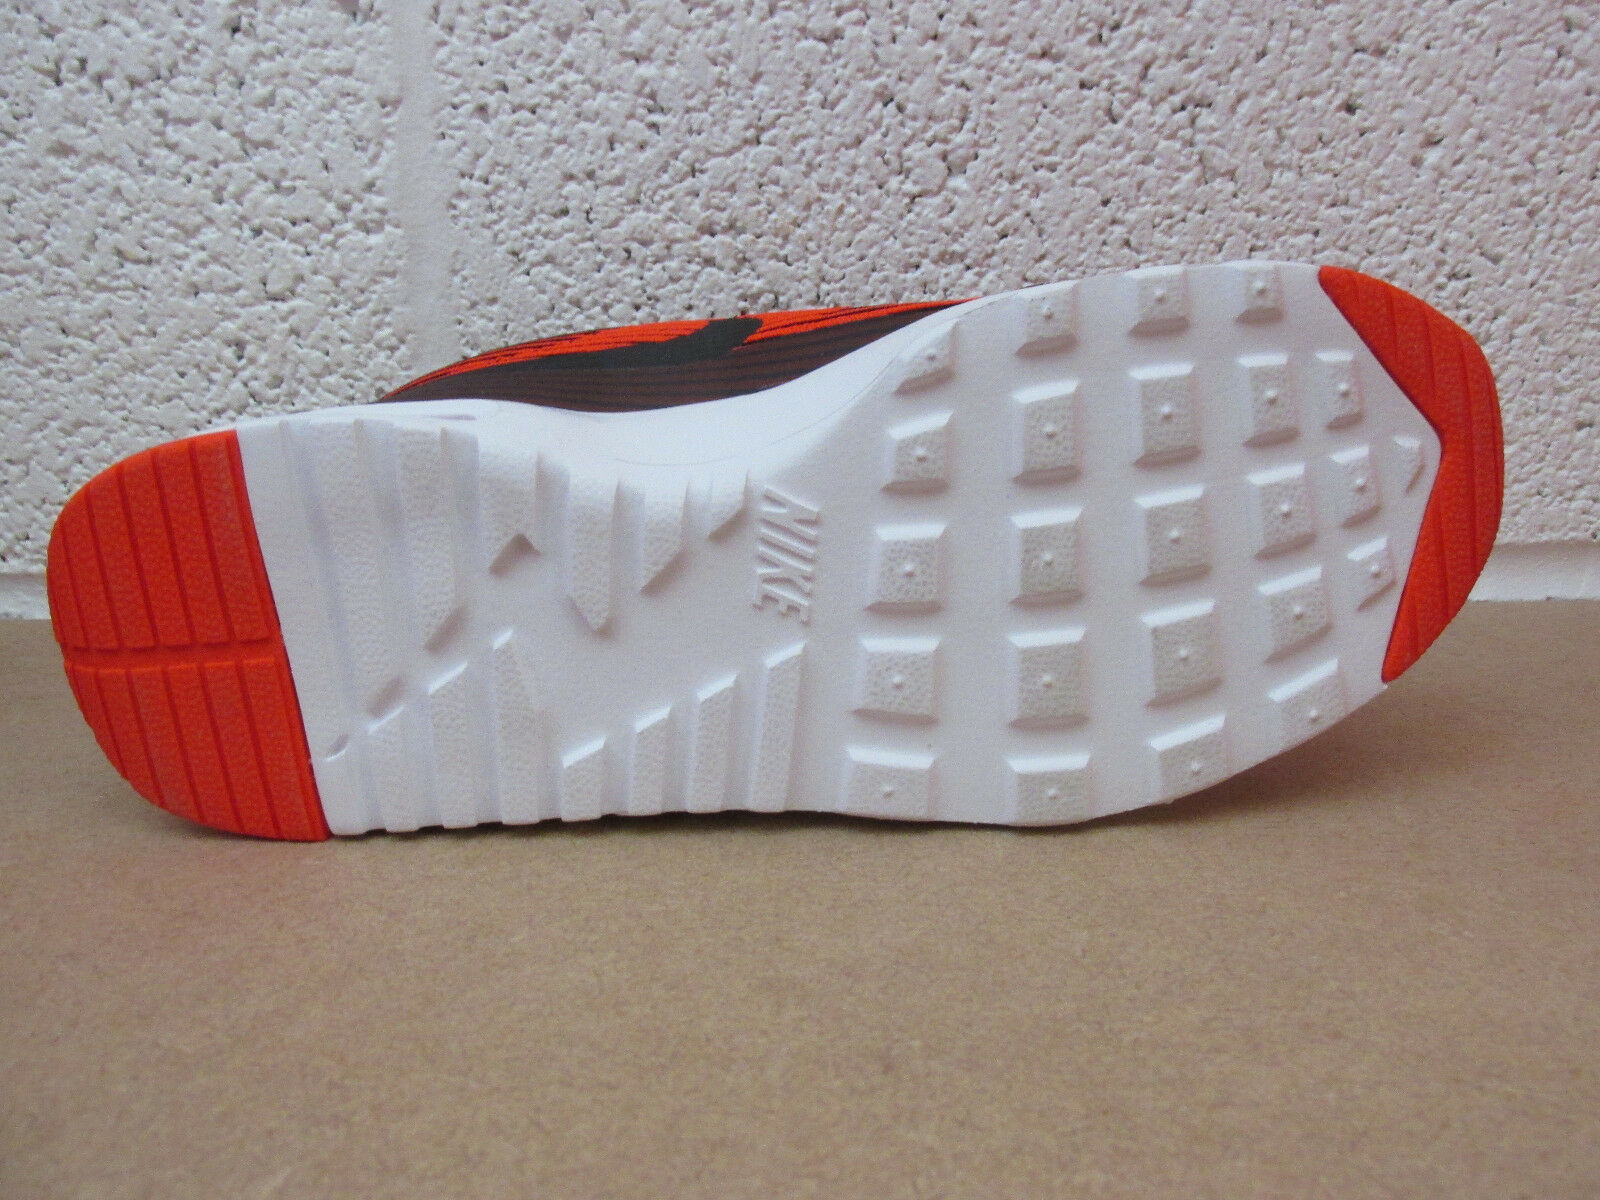 Nike Damen Air Max Turnschuhe Thea Jrcrd Laufschuhe 718646 007 Turnschuhe Max 9e21f2